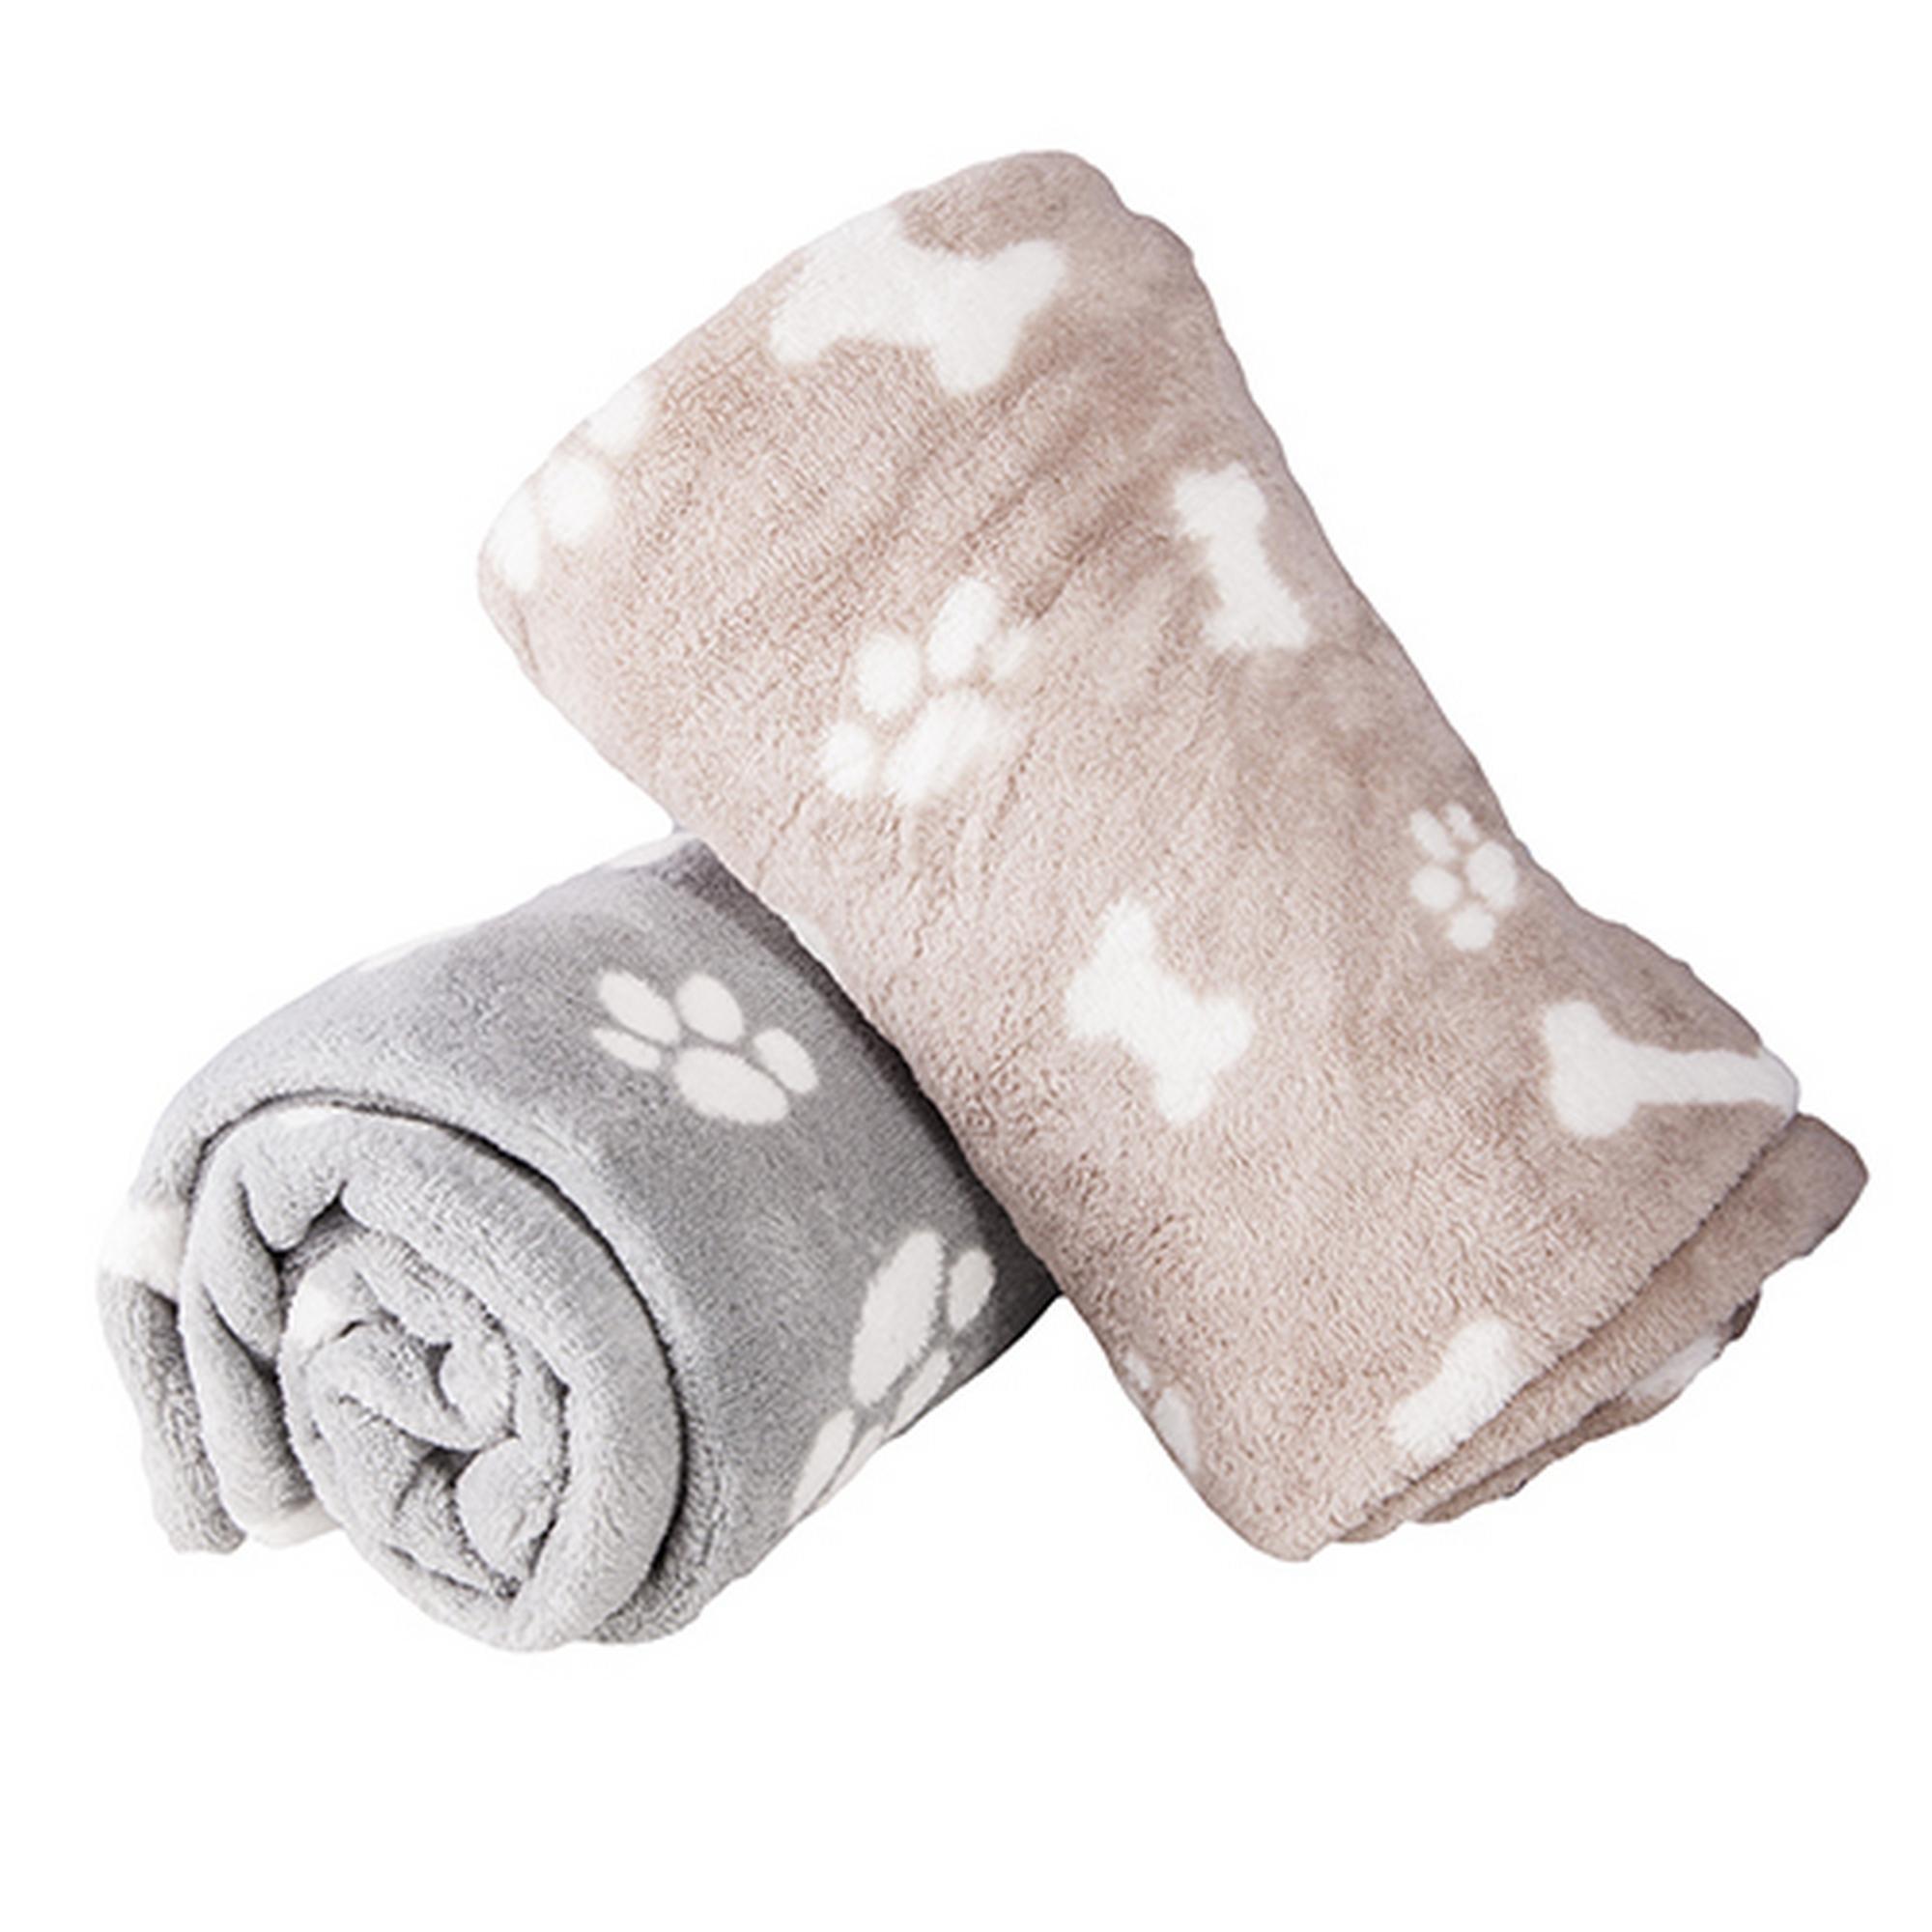 1x Soft Micro Fibre Paw Amp Bone Design Small Dog Blanket